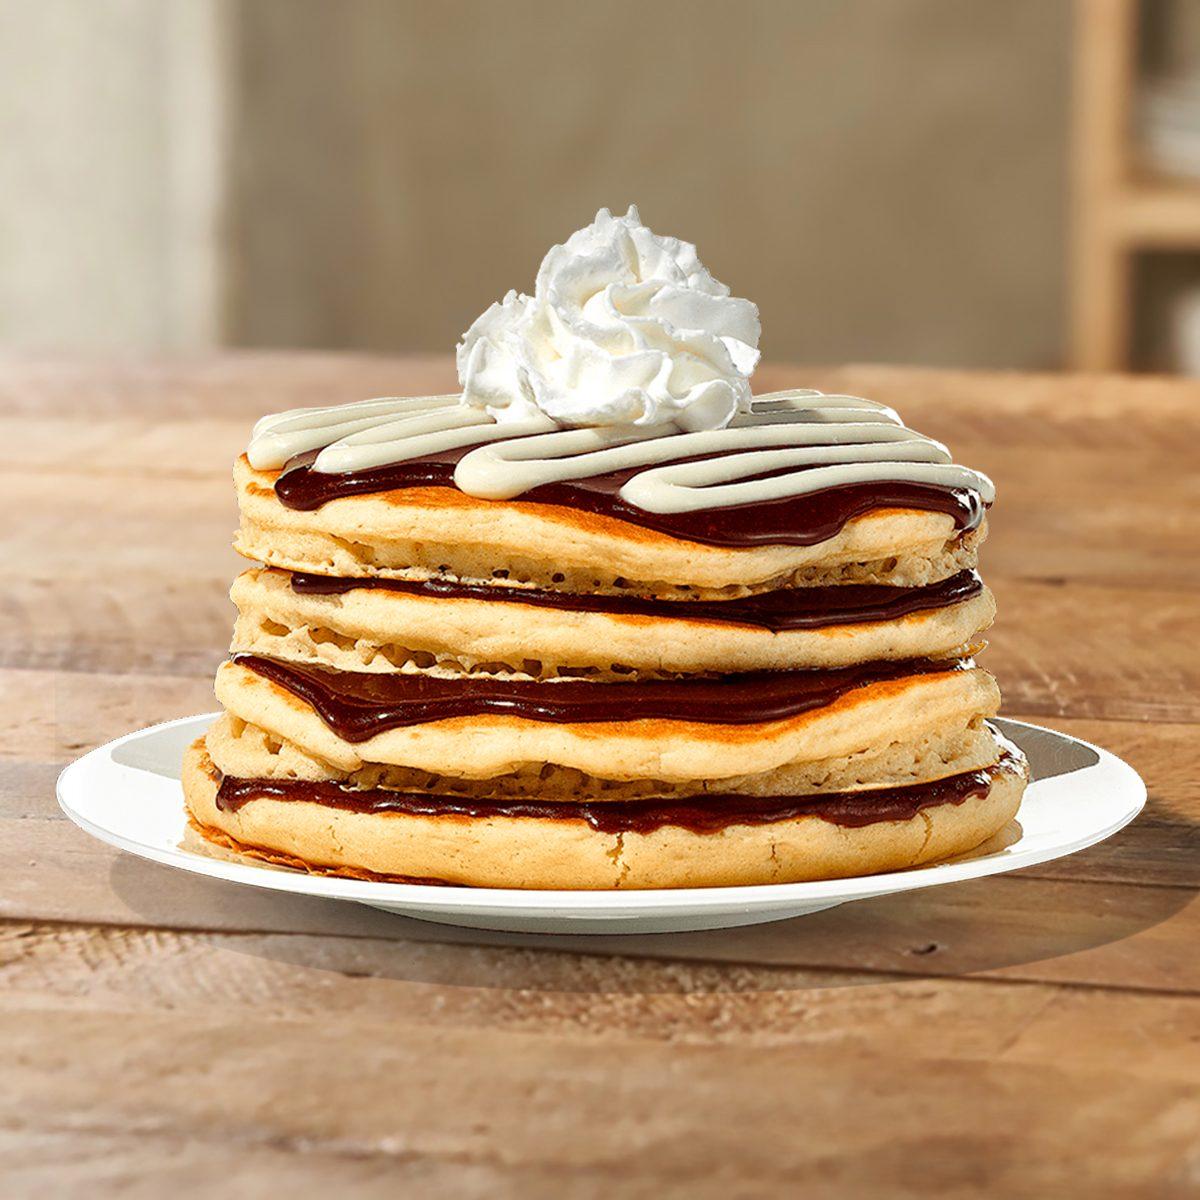 IHOP Cinn-A-Stack Pancakes